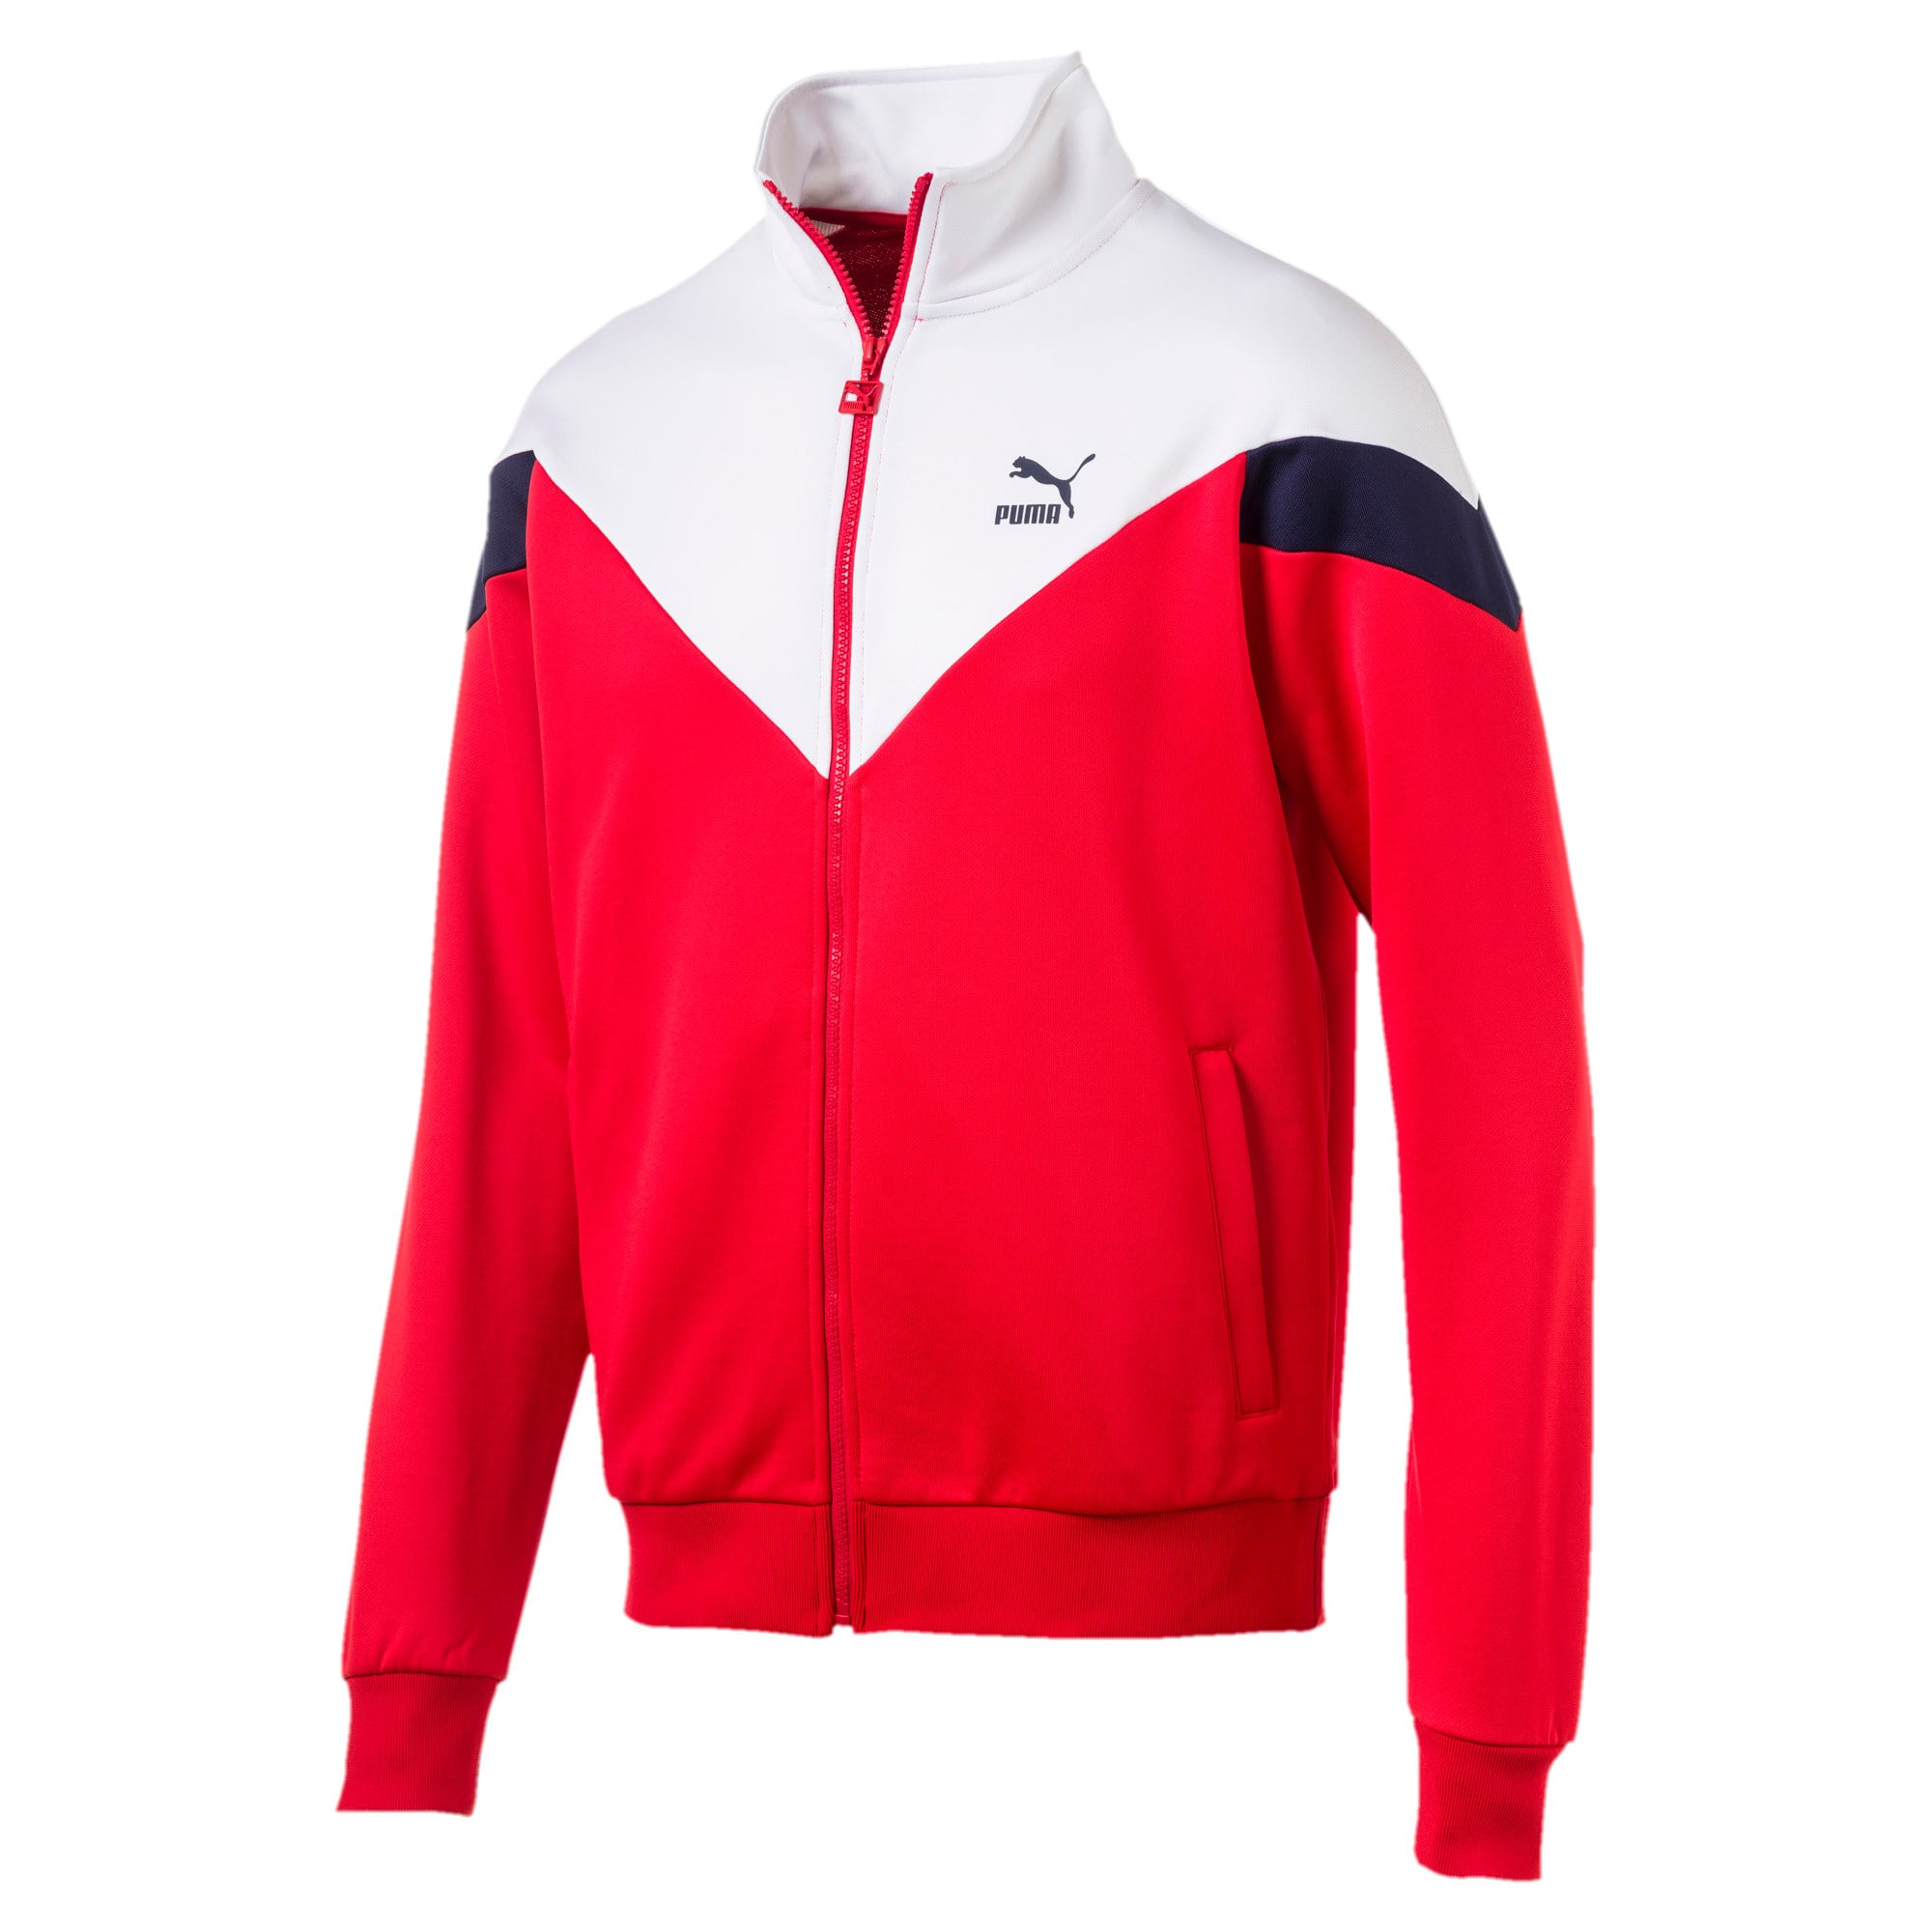 Thumbnail 1 of Iconic MCS Men's Track Jacket, High Risk Red, medium